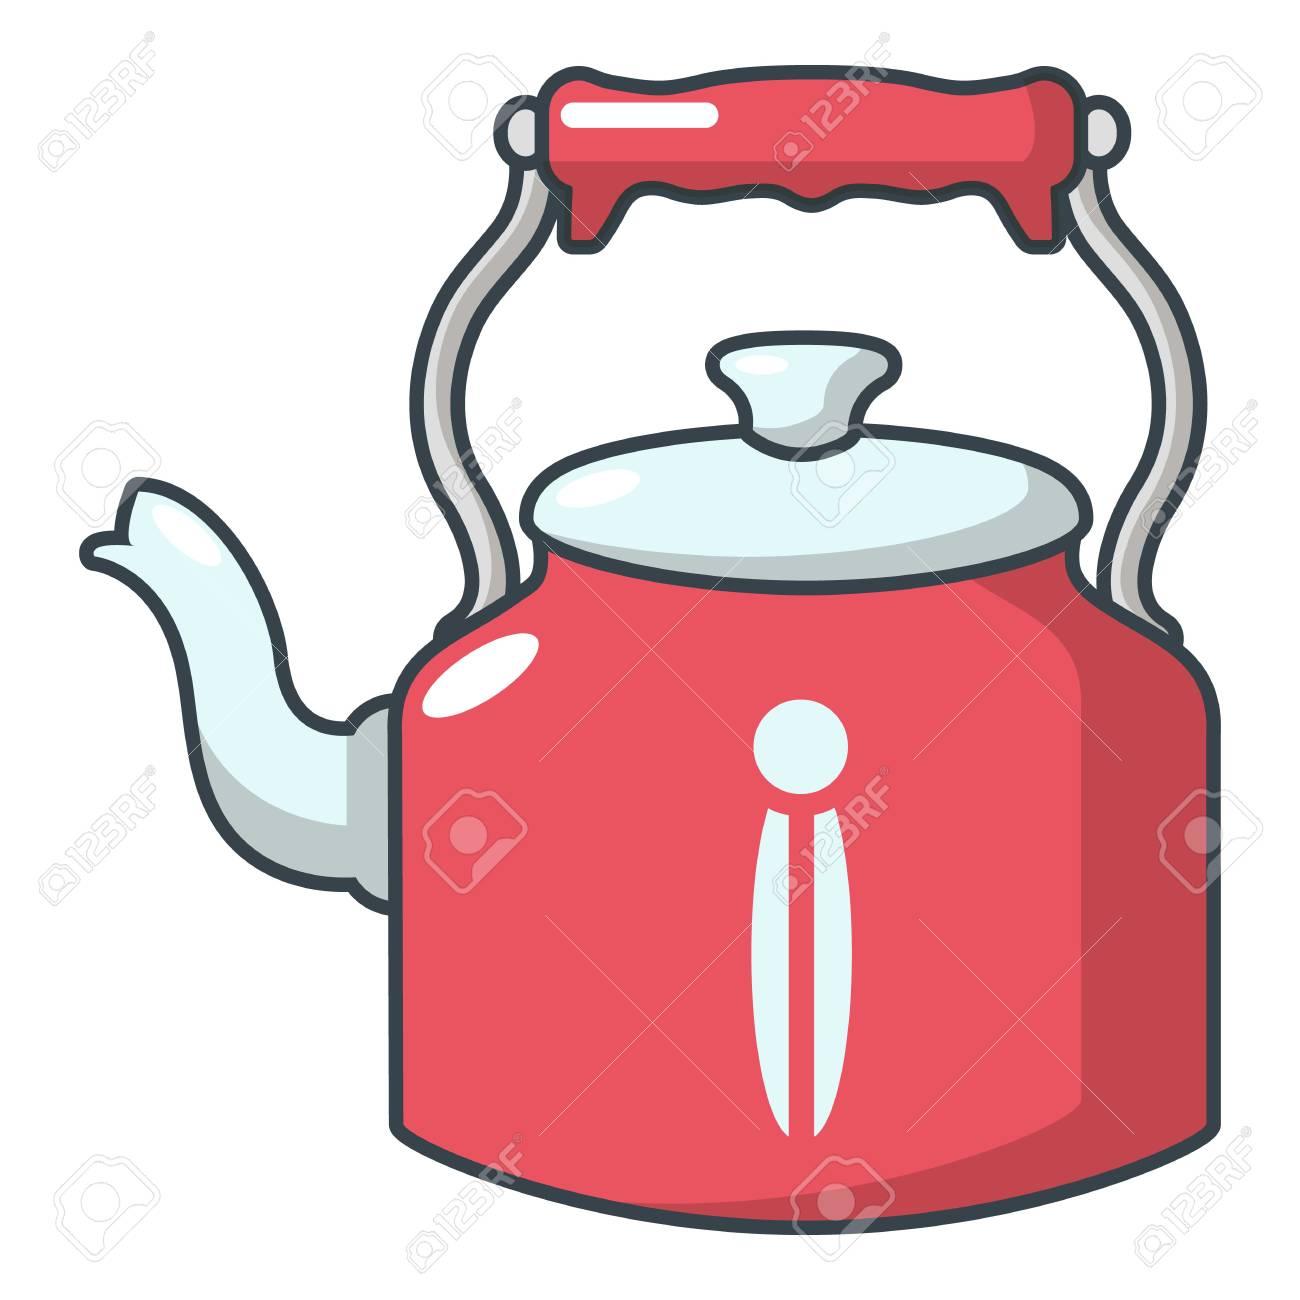 Home Teapot Icon Cartoon Illustration Of Home Teapot Vector